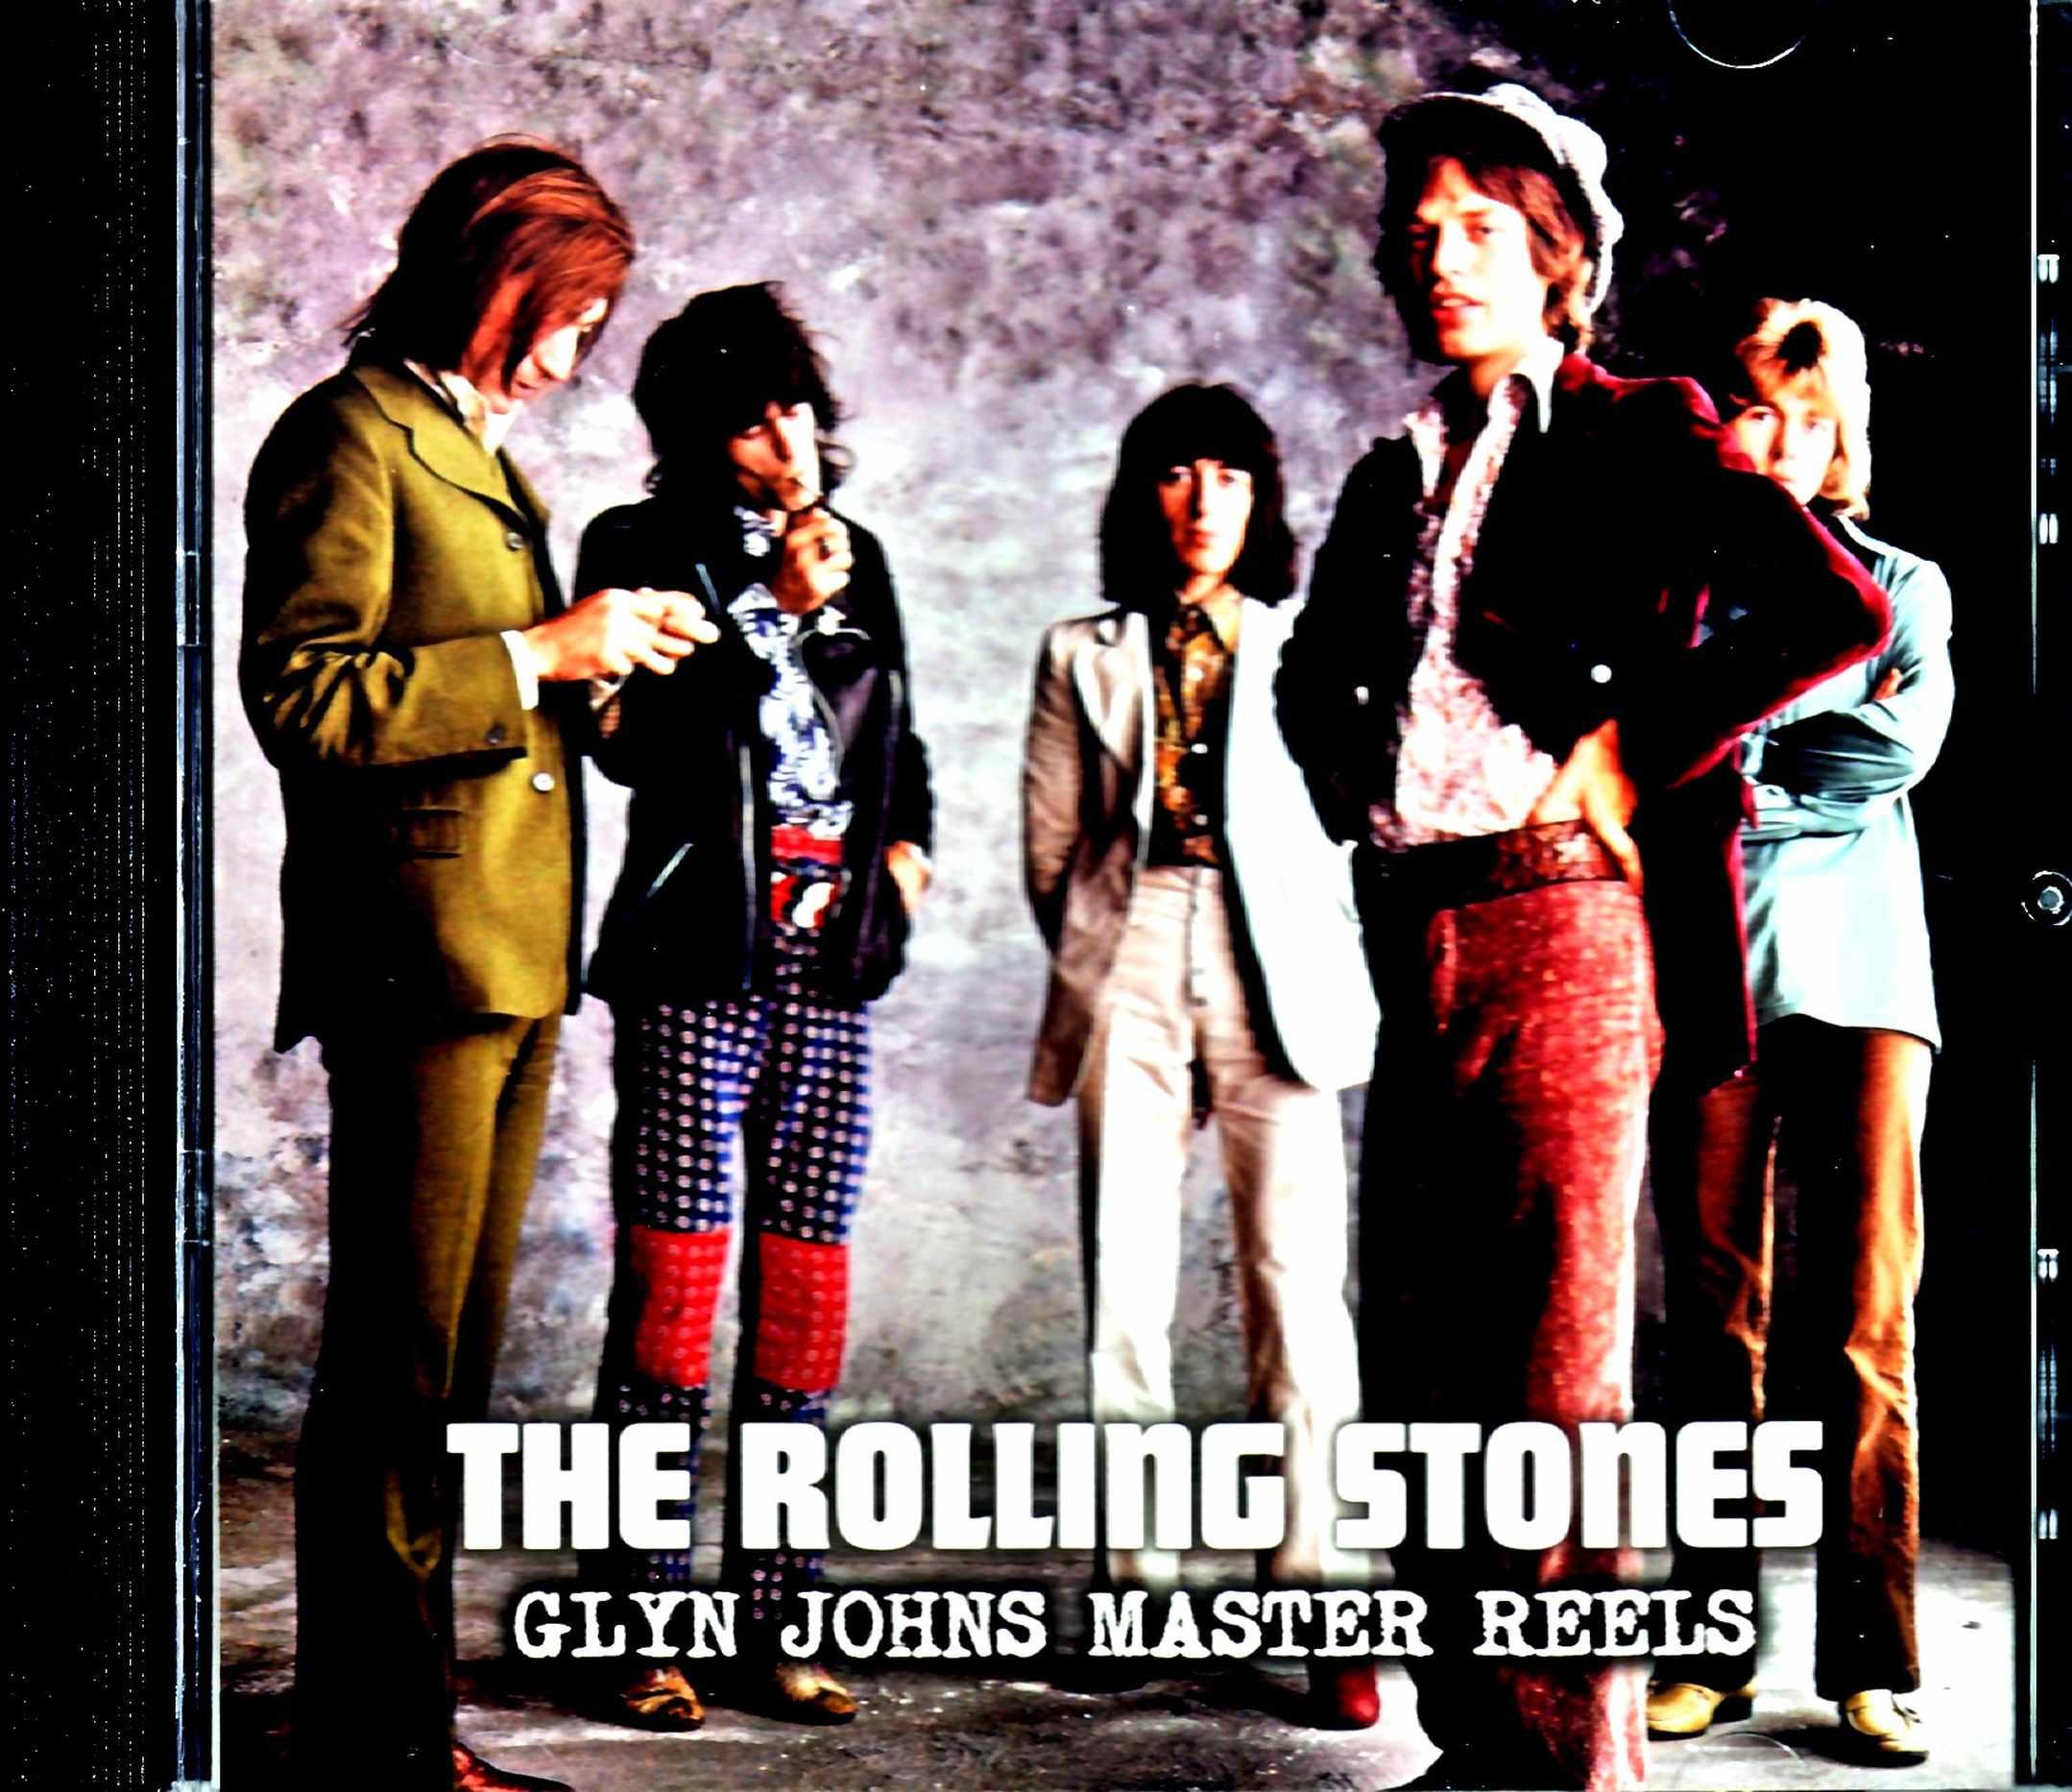 Rolling Stones ローリング・ストーンズ/Glyn Johns Master Reels